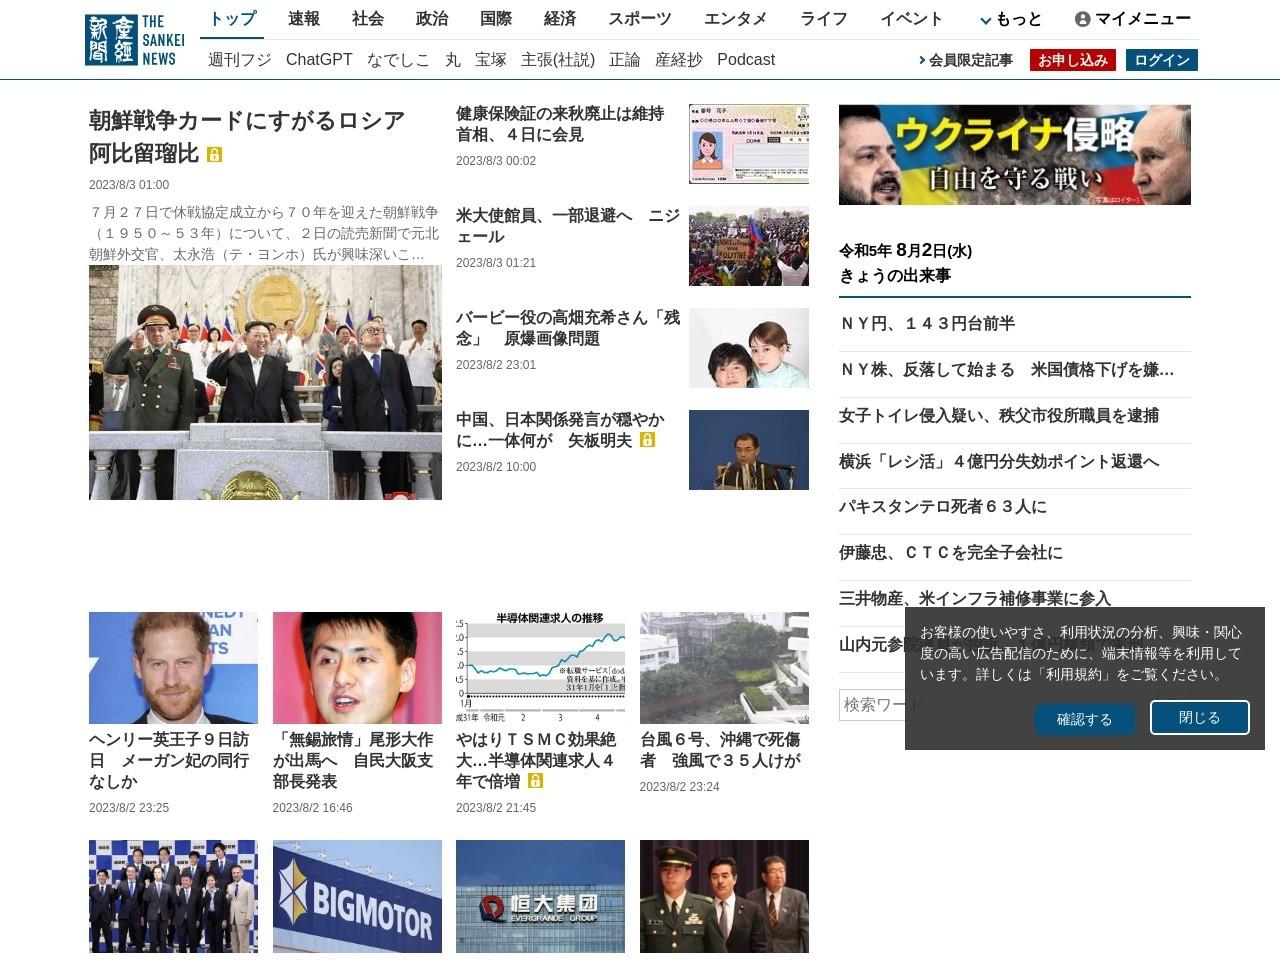 http://www.sankei.com/west/news/160223/wst1602230130-n1.html